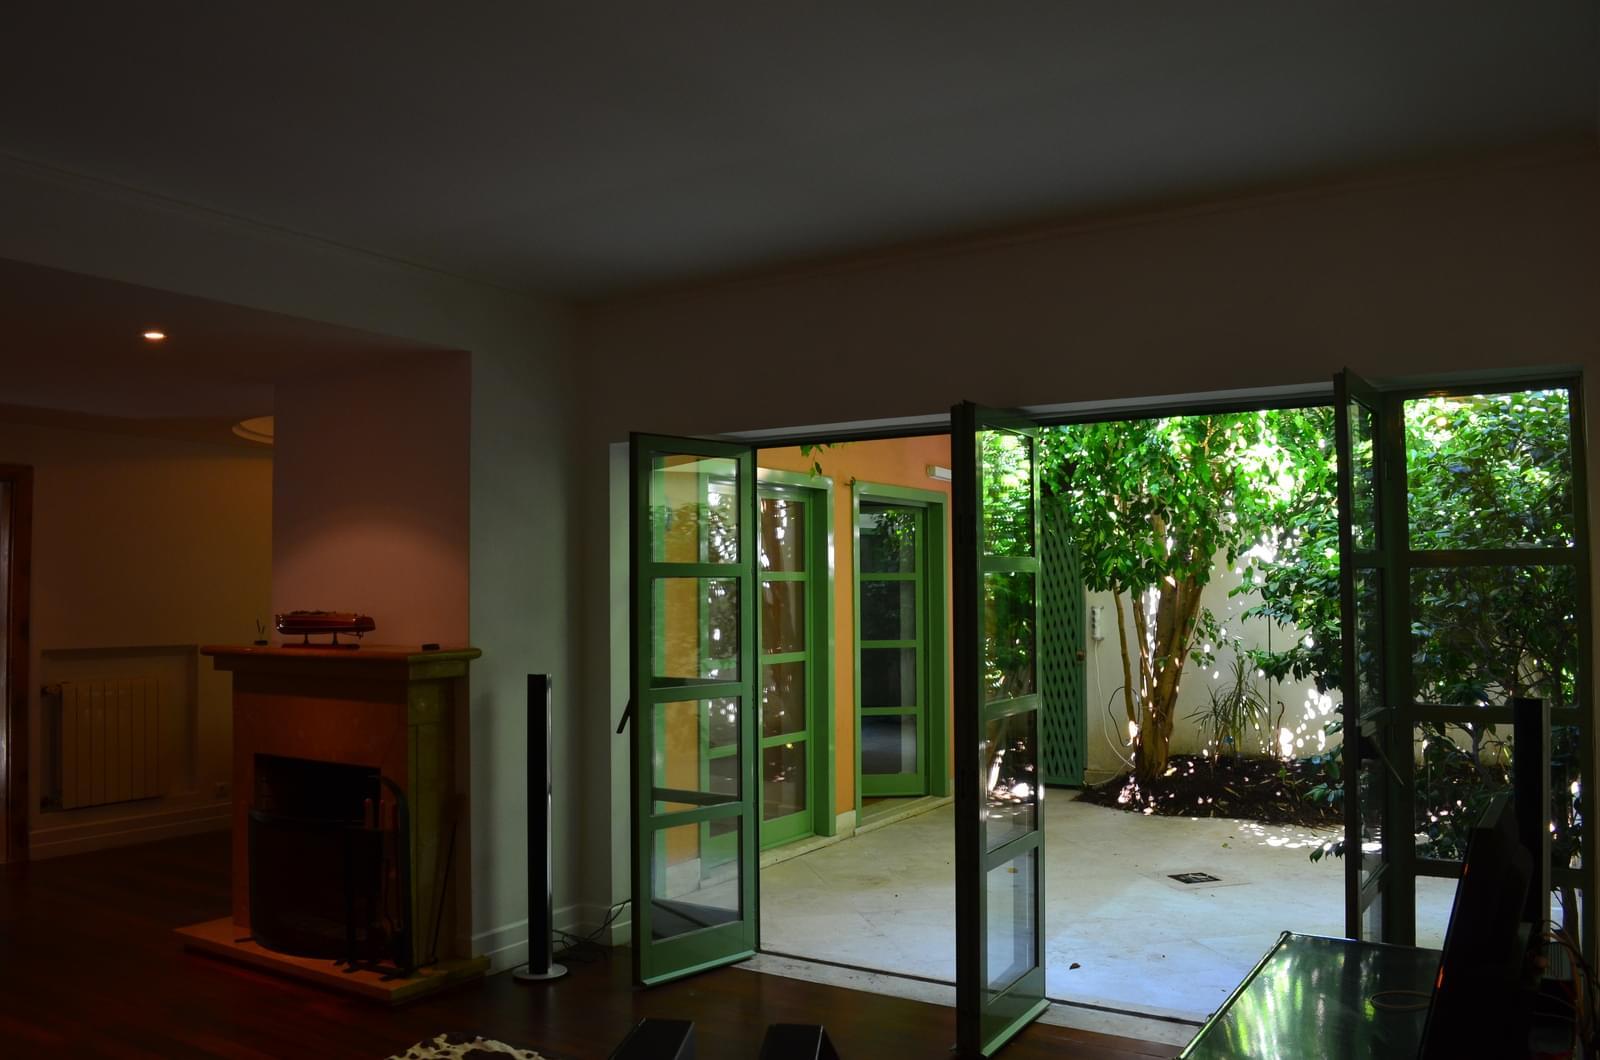 pf17565-apartamento-t3-lisboa-a3715323-c1d5-4087-acdb-75875123c3b6